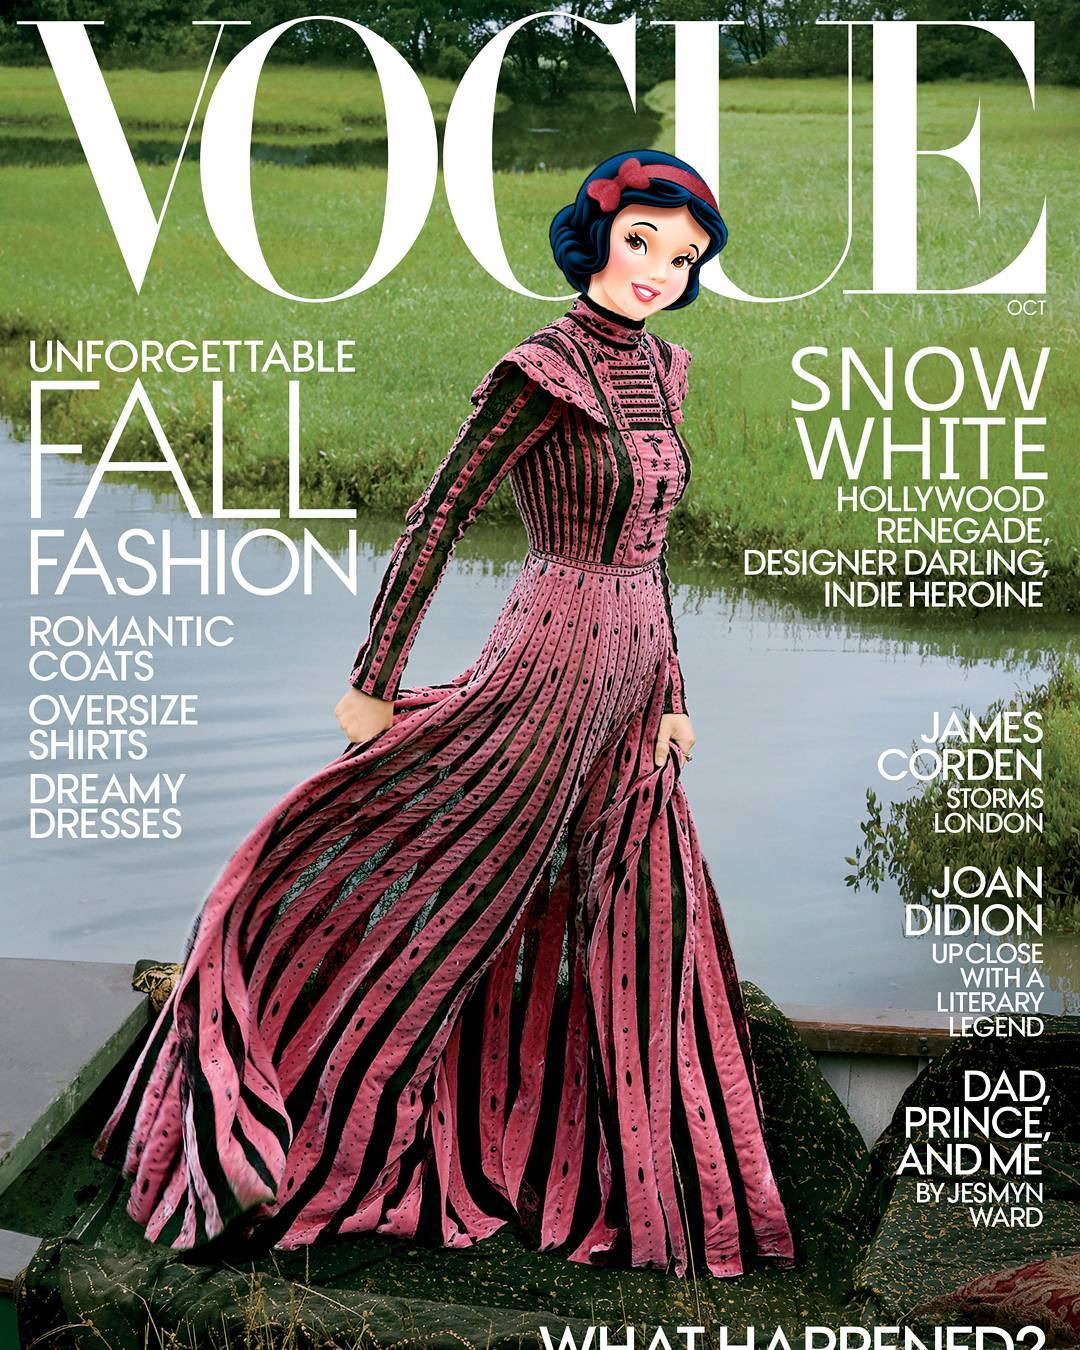 Snowwhite as Rooney Mara